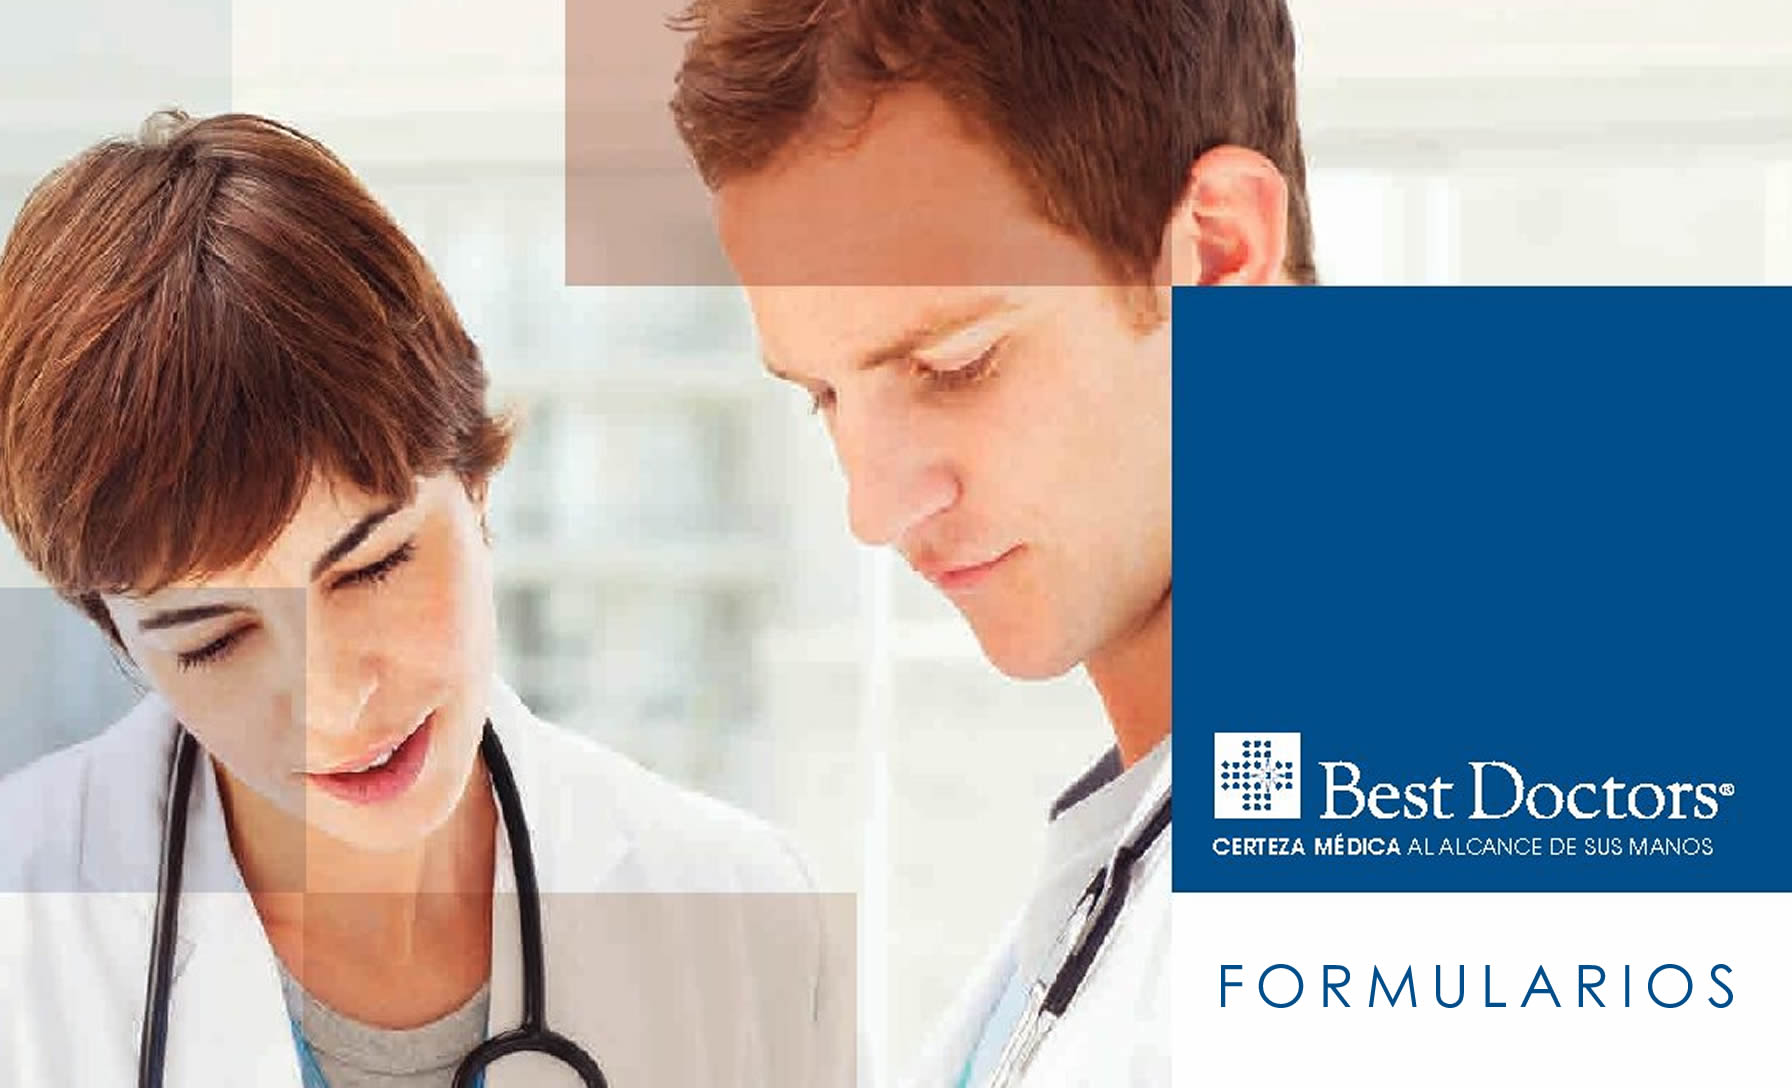 Best Doctors formularios